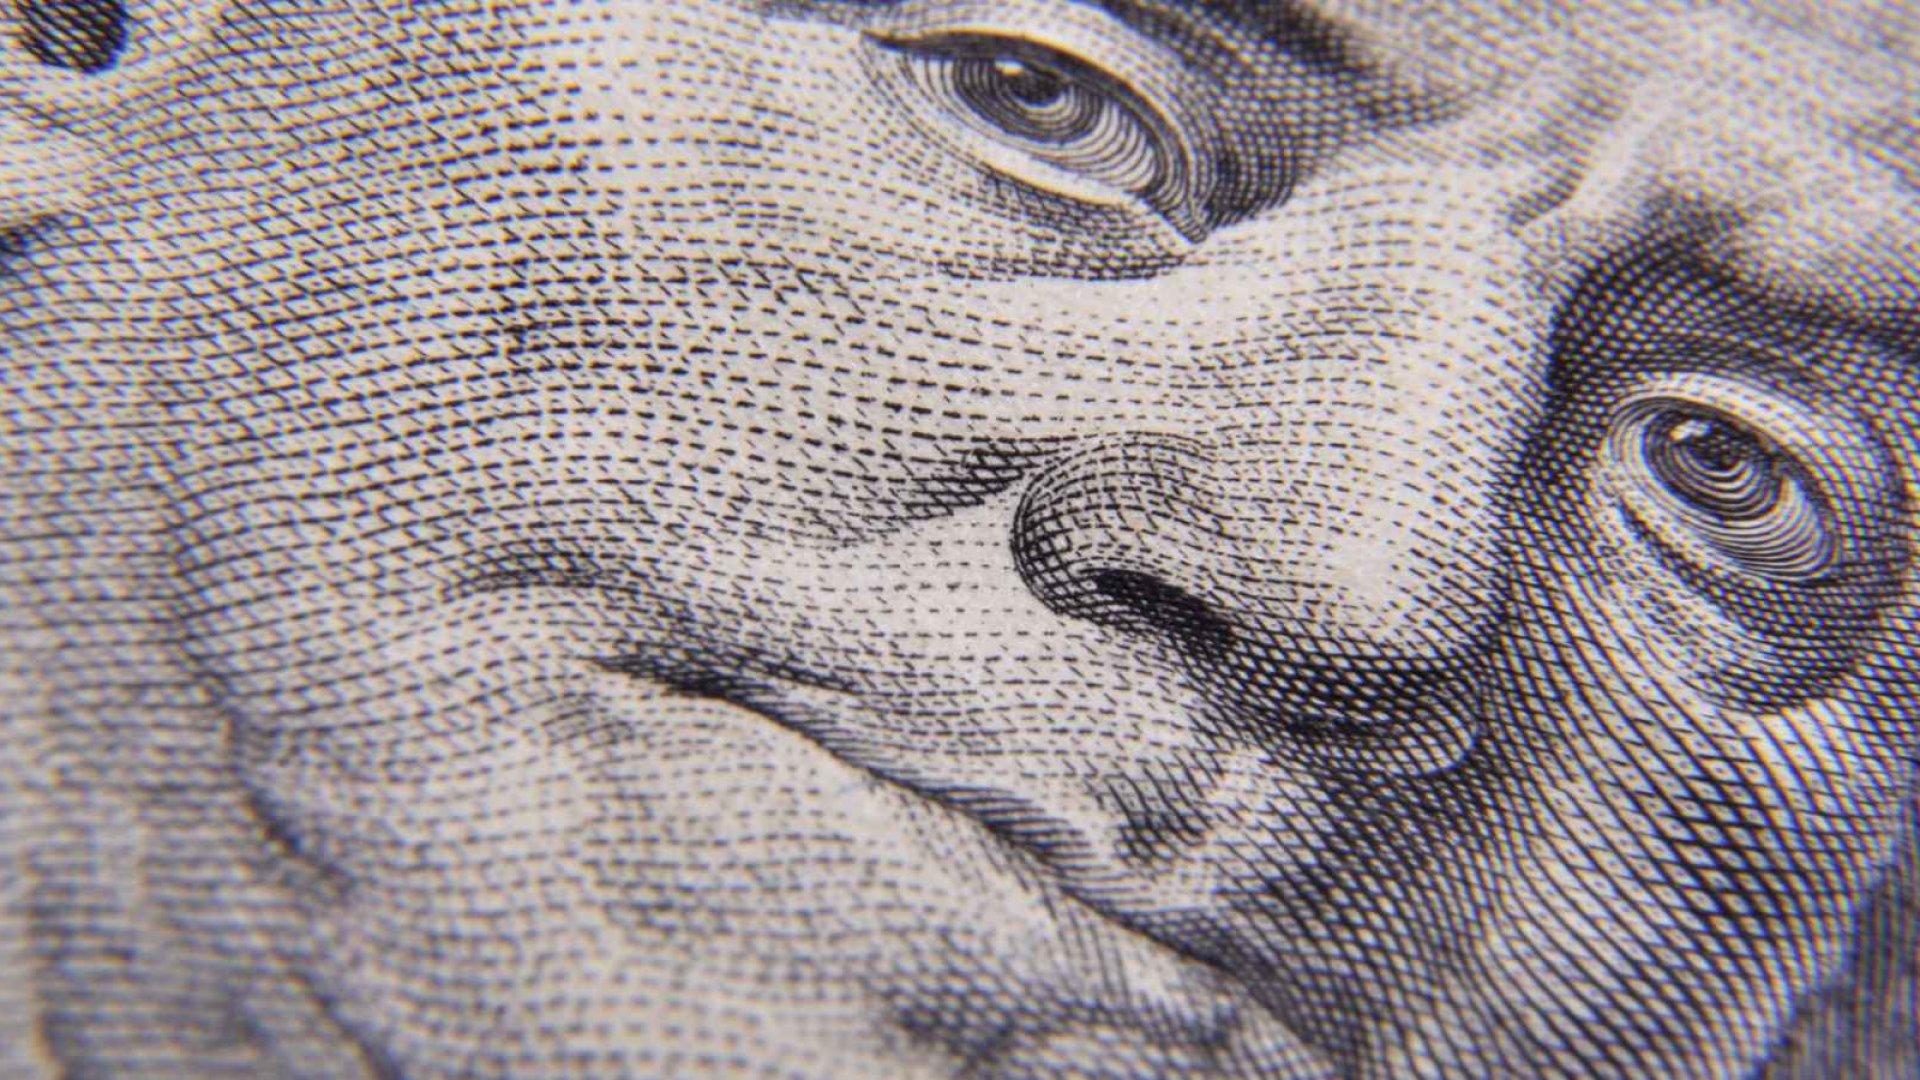 Venture Capital Spending Hits Highest Level Since 2000